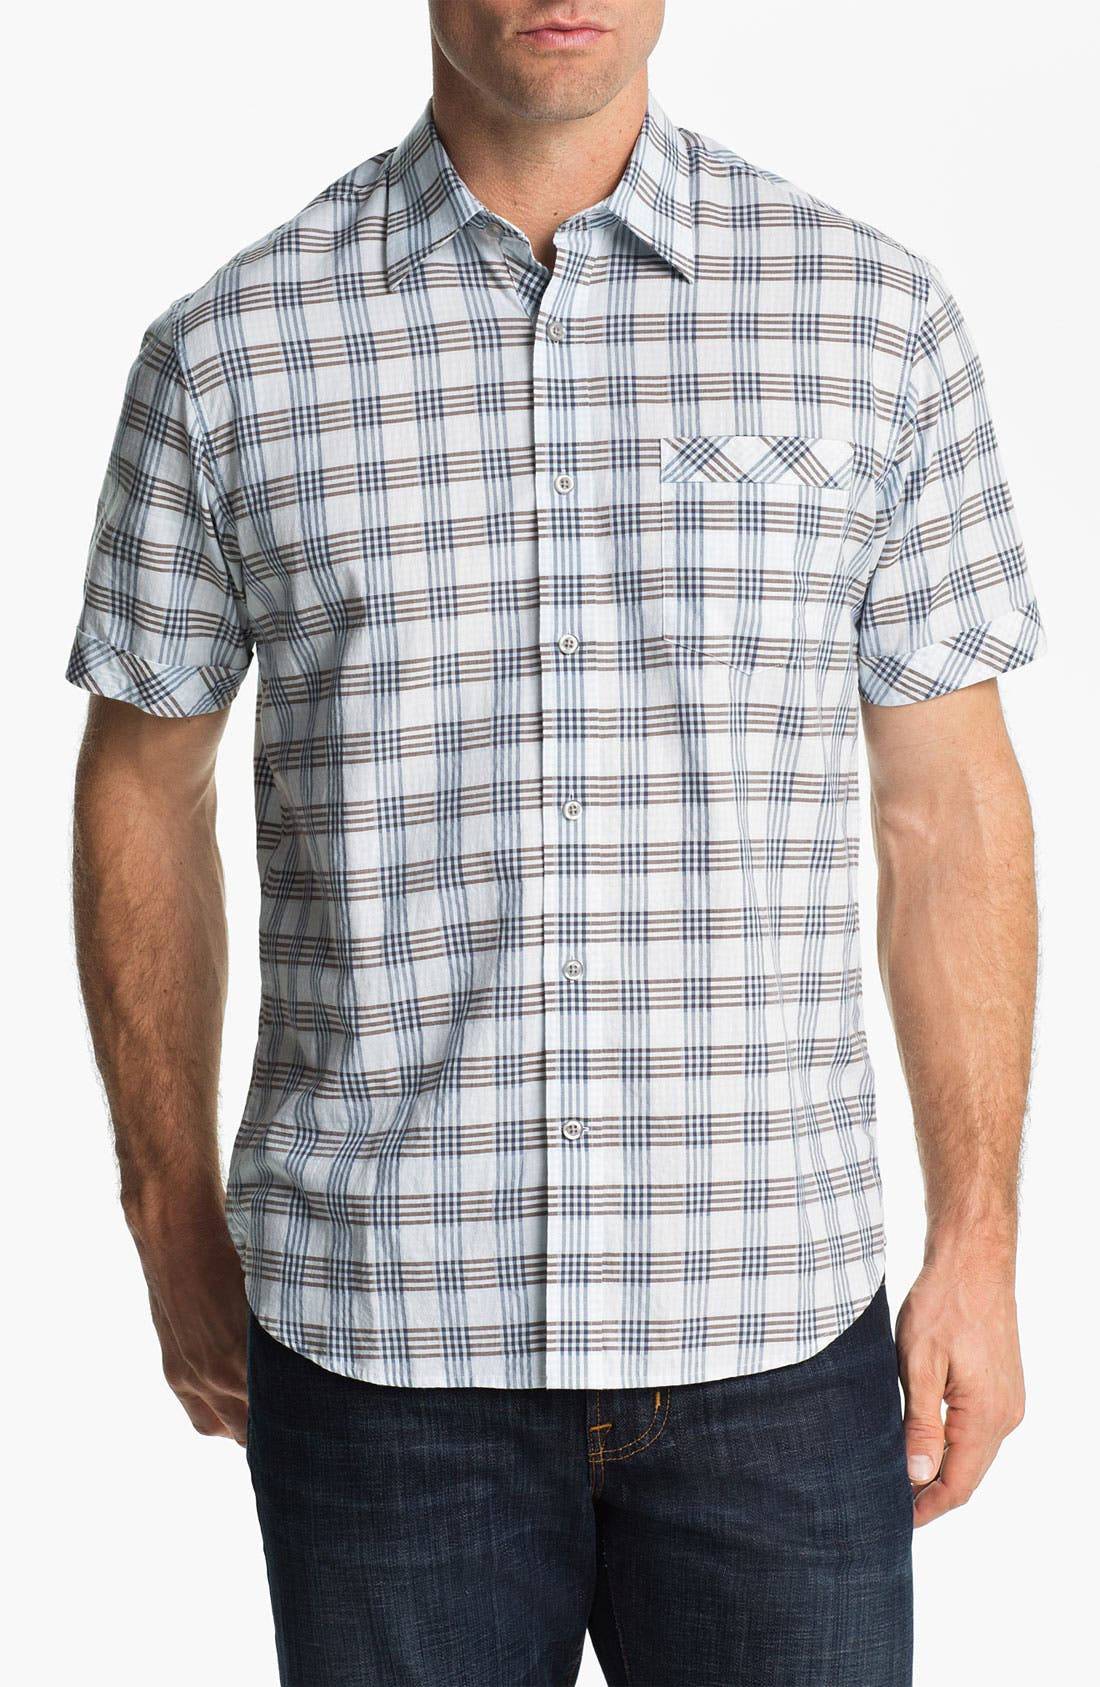 Alternate Image 1 Selected - James Campbell 'Blum Plaid' Sport Shirt